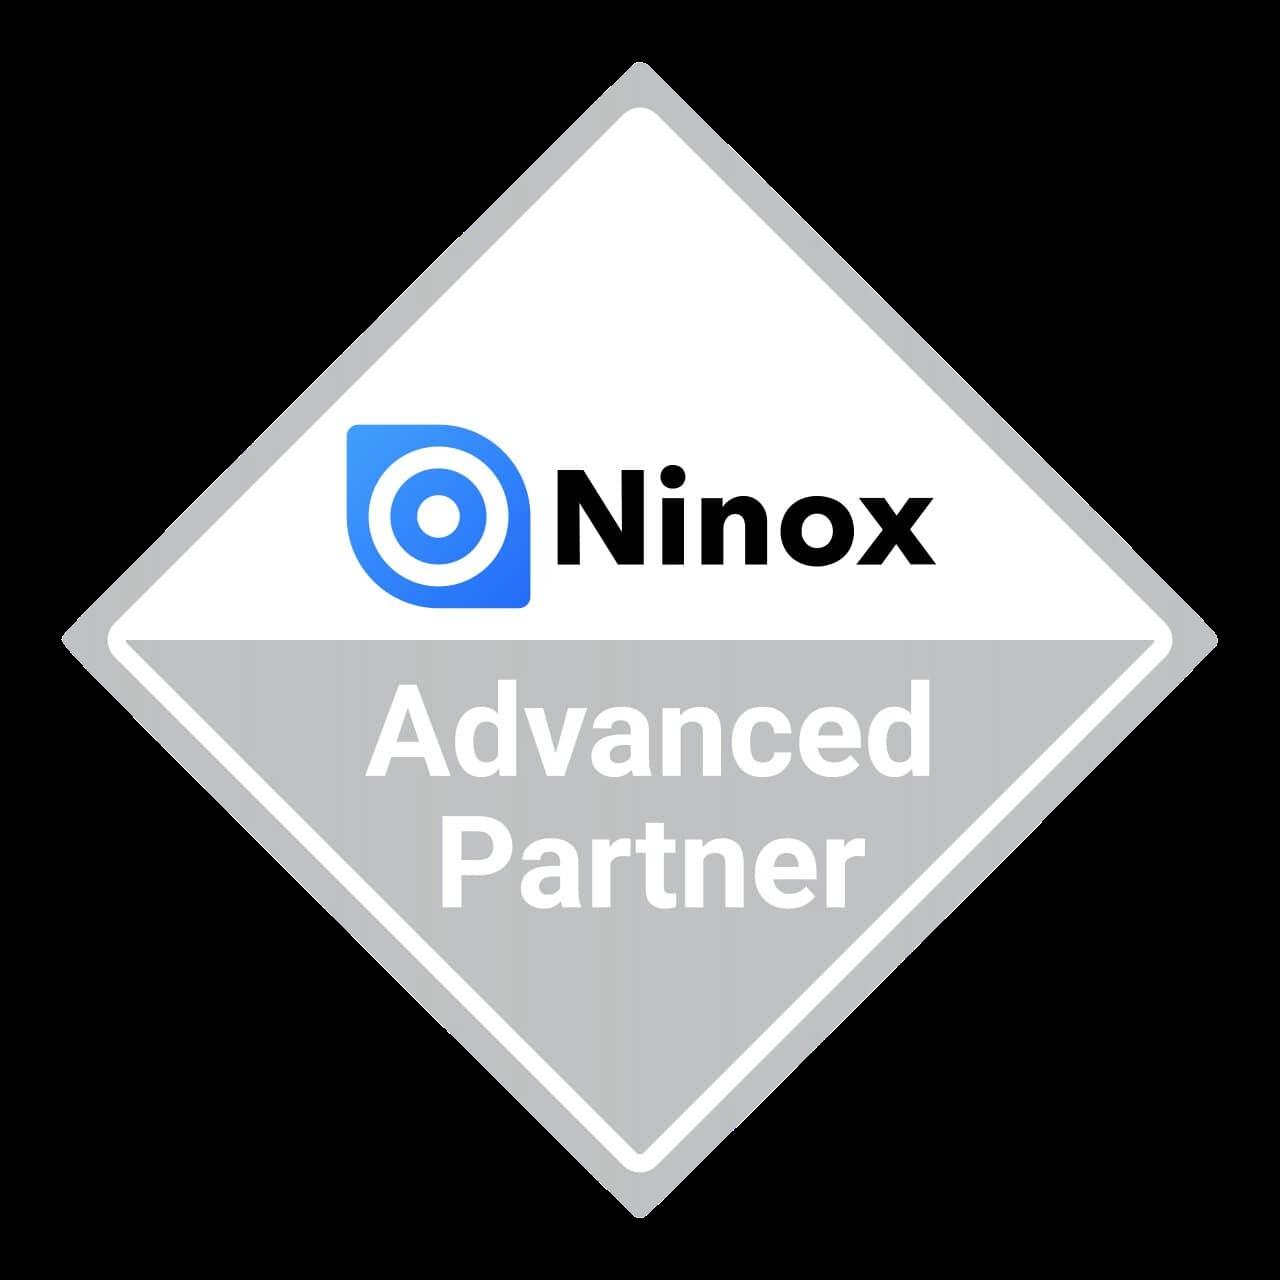 Ninox Advanced Partner